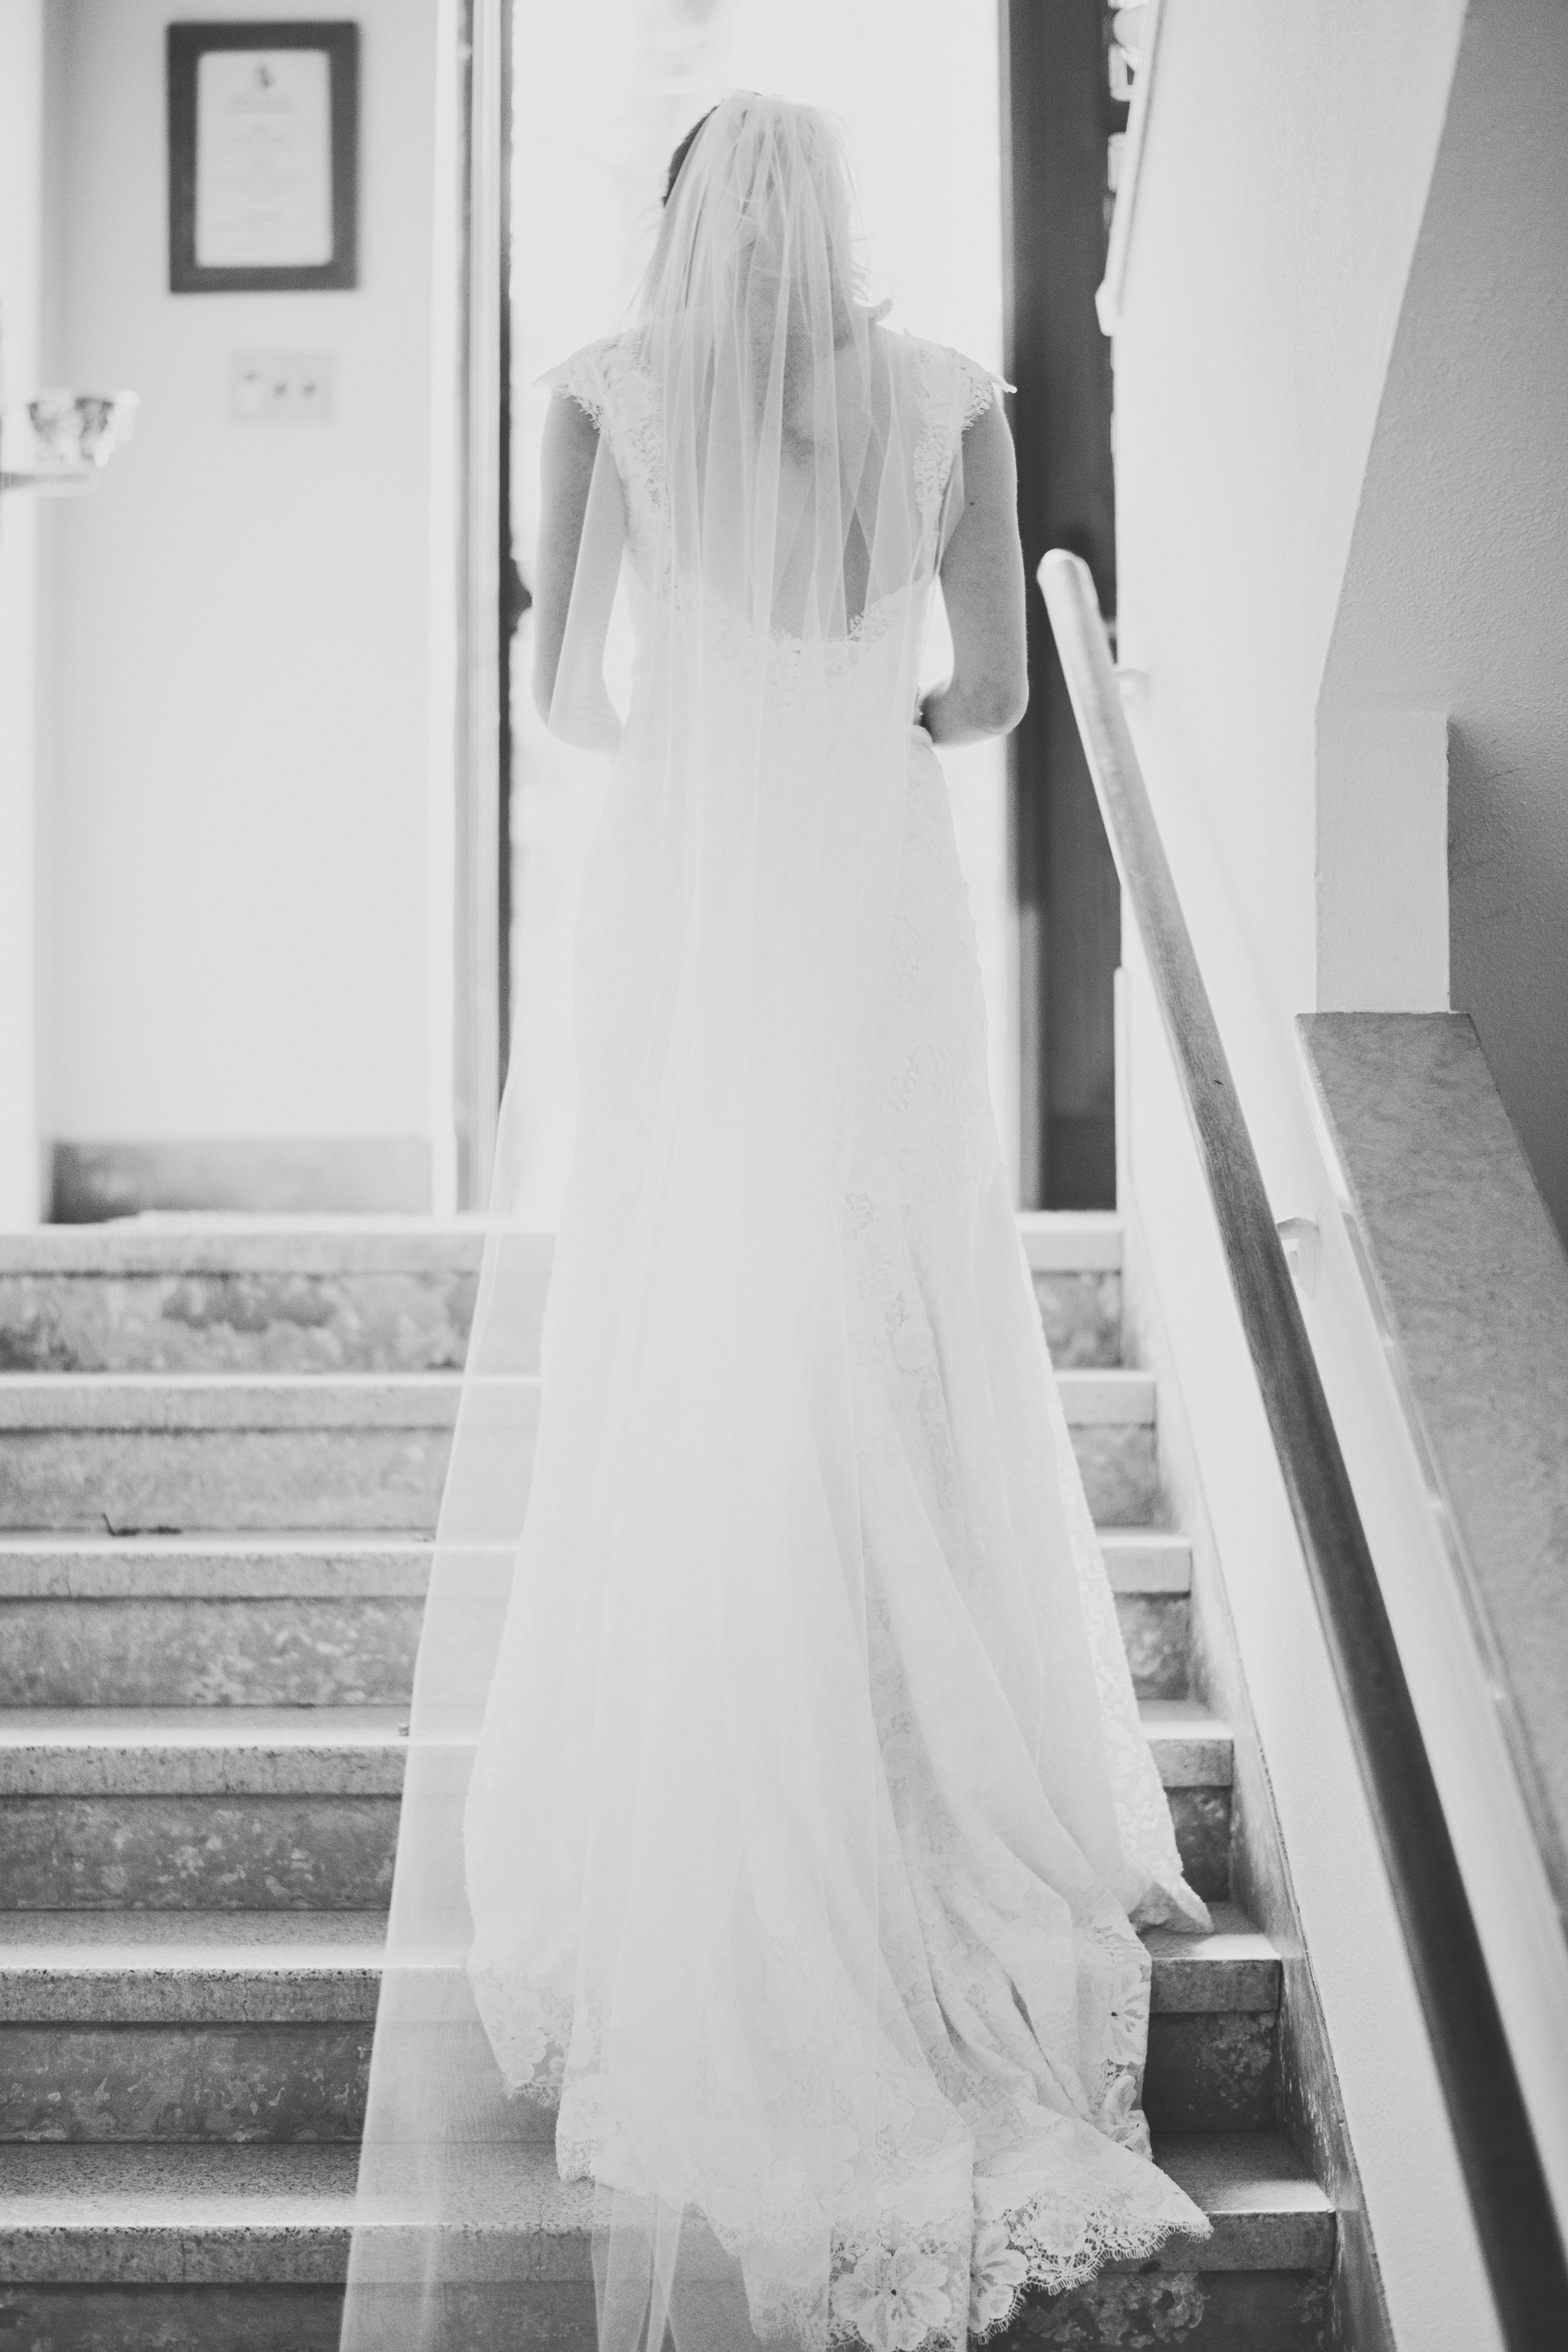 best_wedding_photography_2017_by_lucas_botz_photography_002.jpg